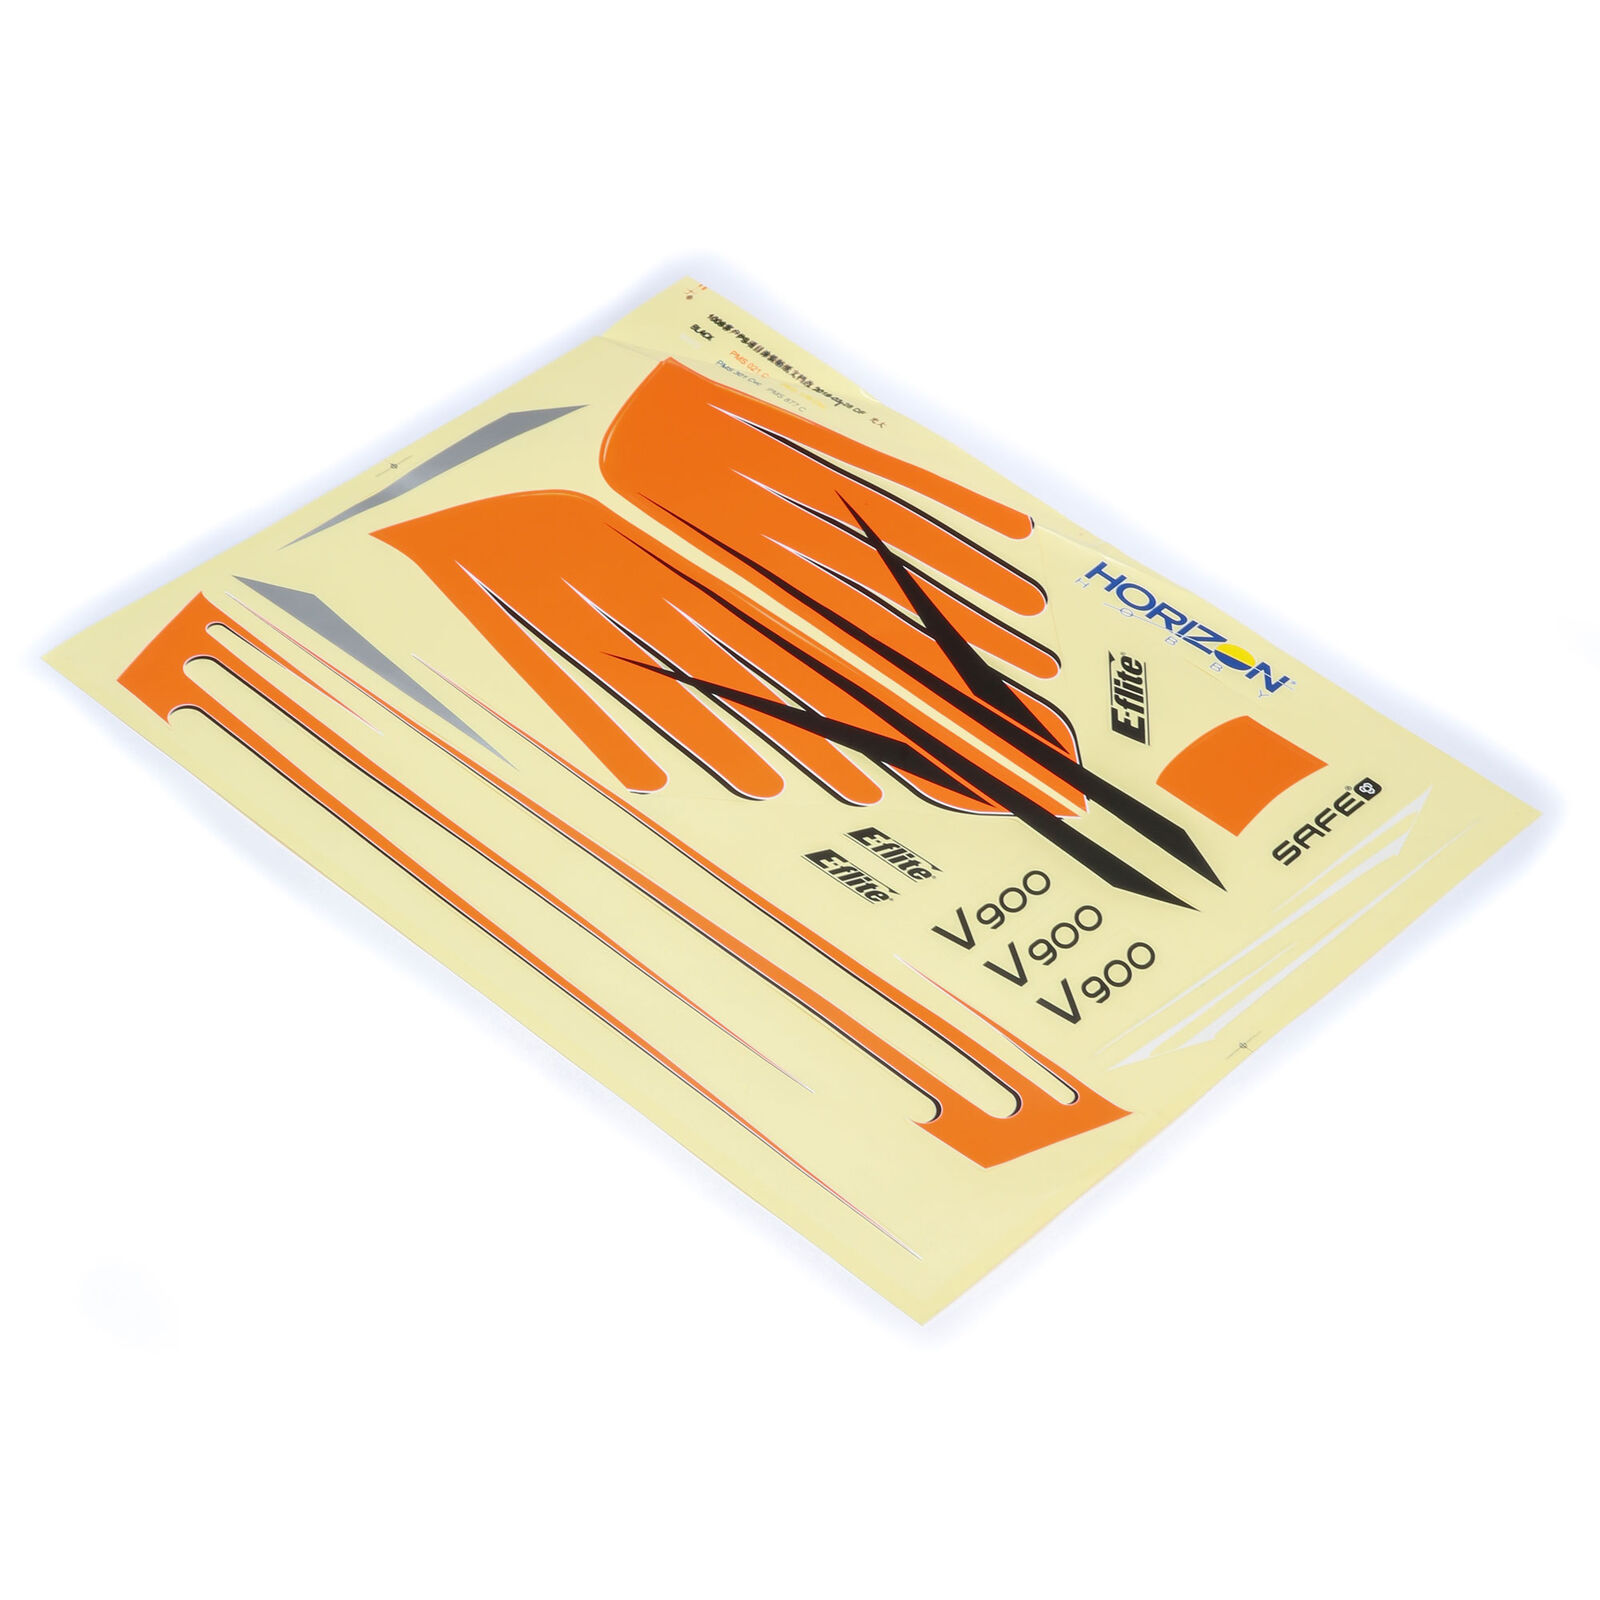 Decal Sheet: V900, 900mm